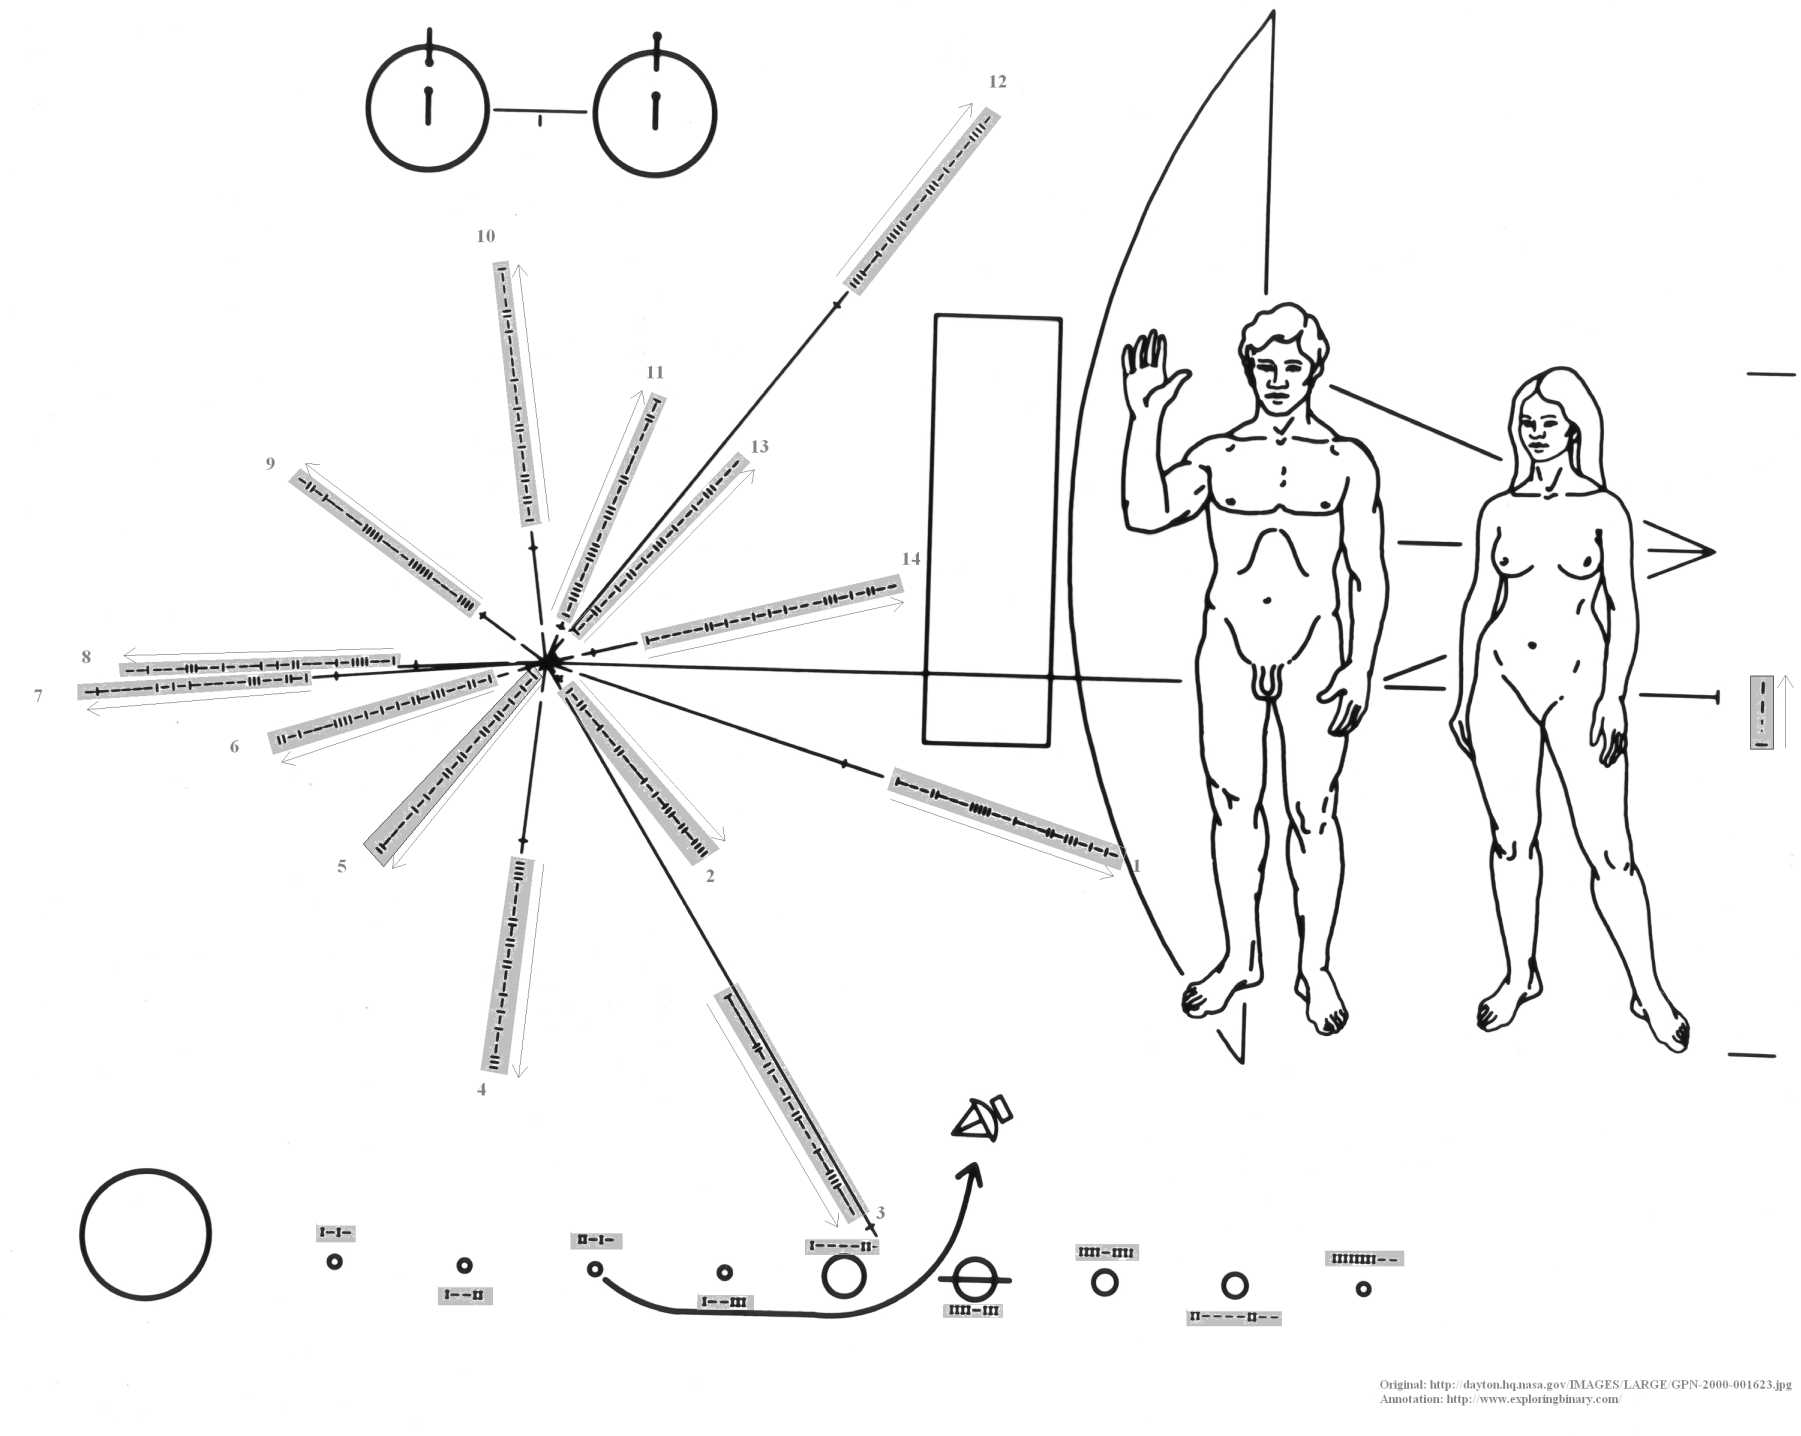 Binary Code On The Pioneer 10 Spacecraft